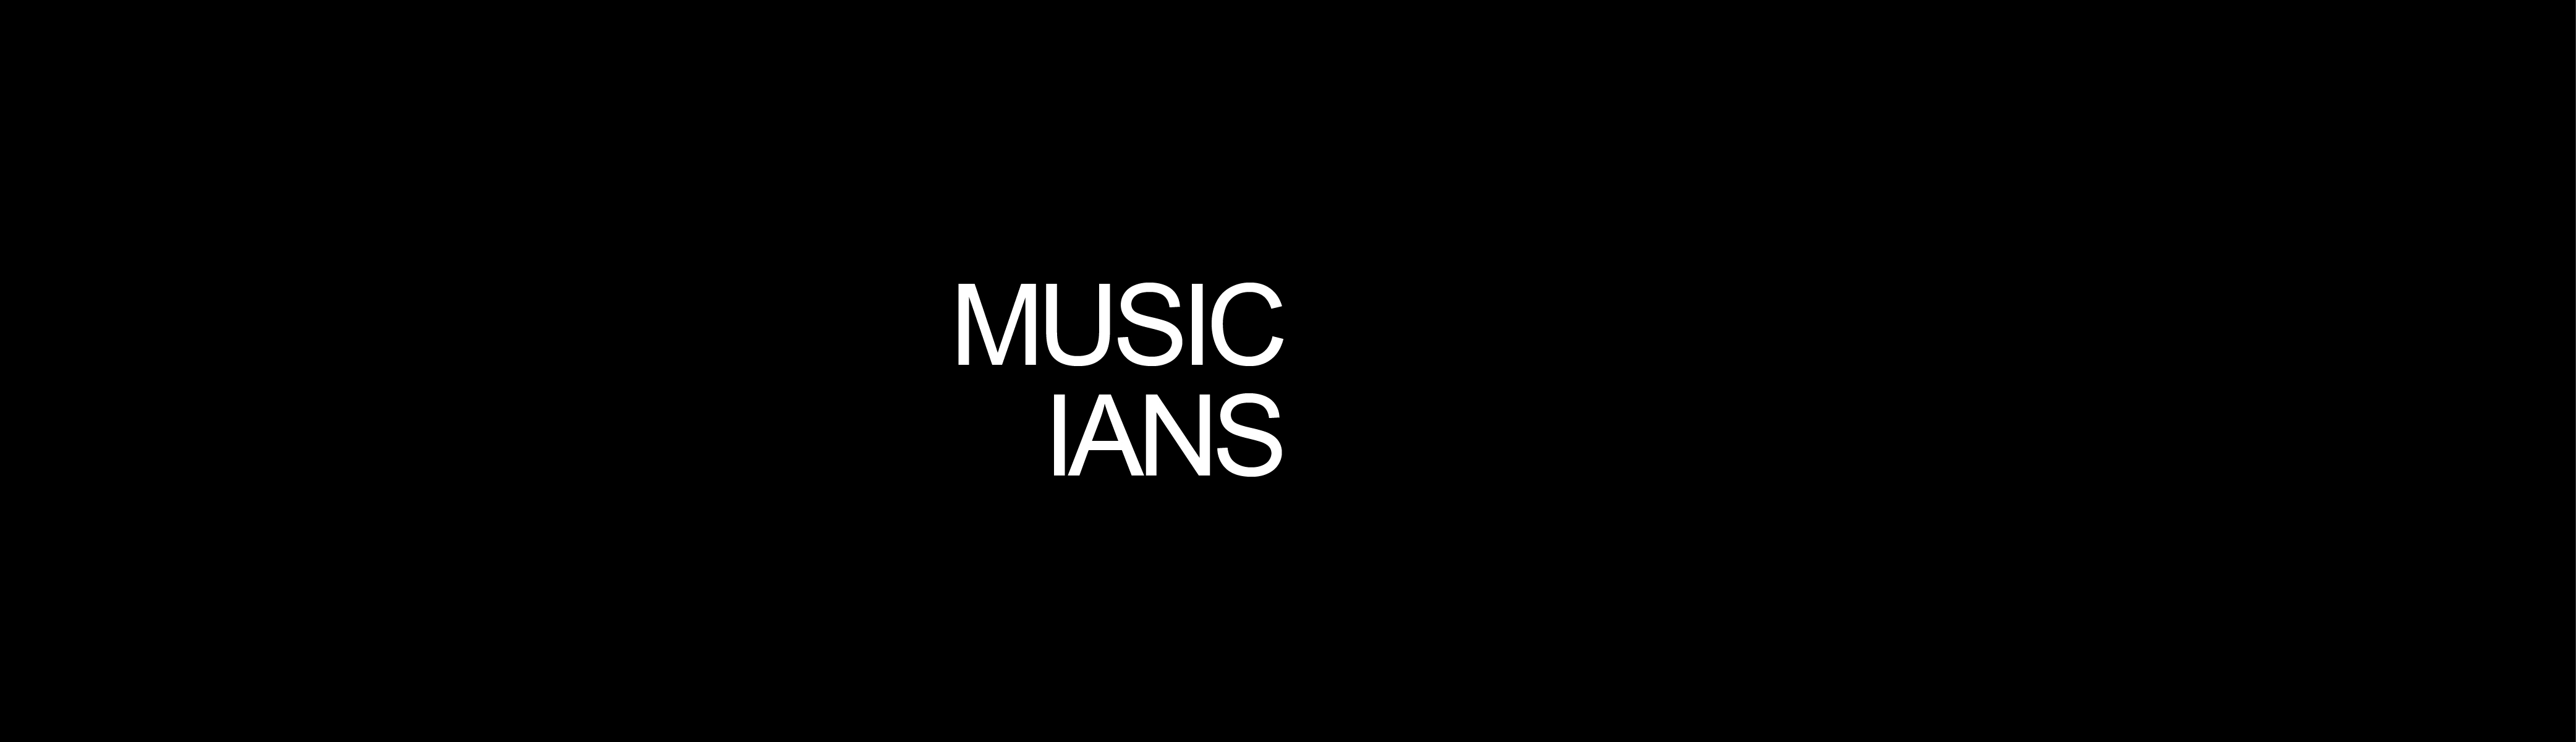 BANNER-Musicians.jpg